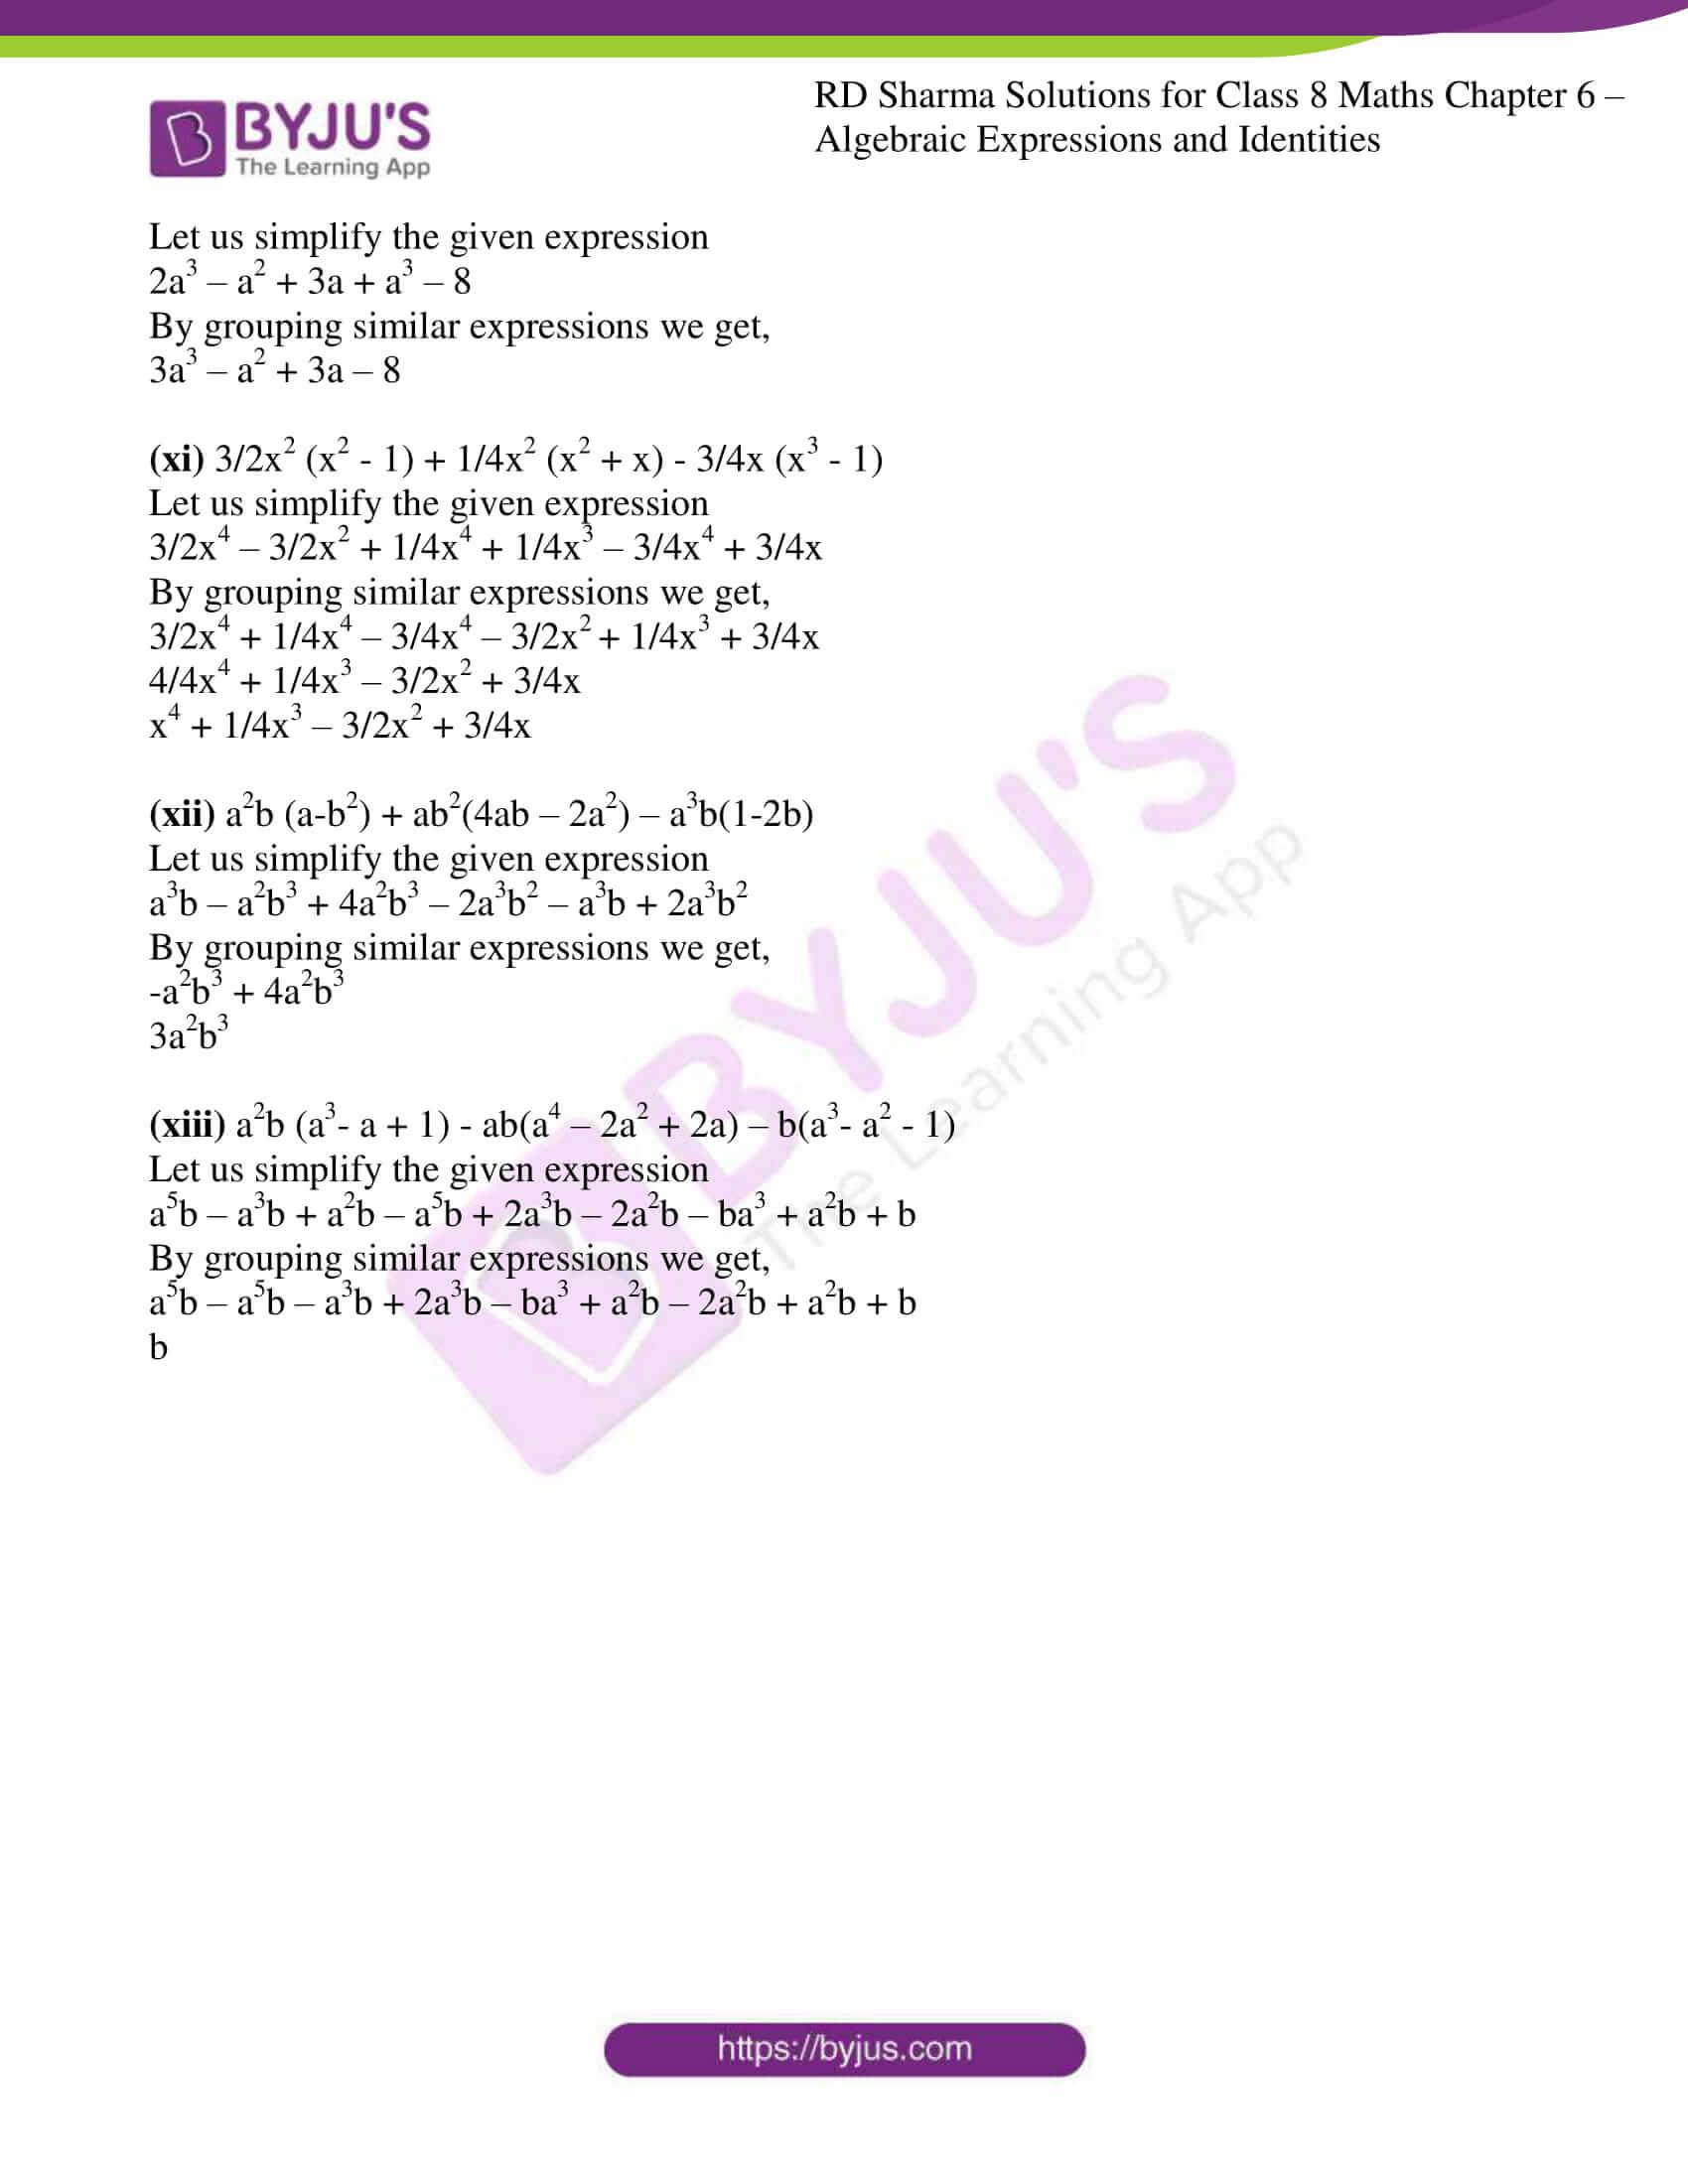 rd sharma class 8 maths chapter 6 exercise 4 8